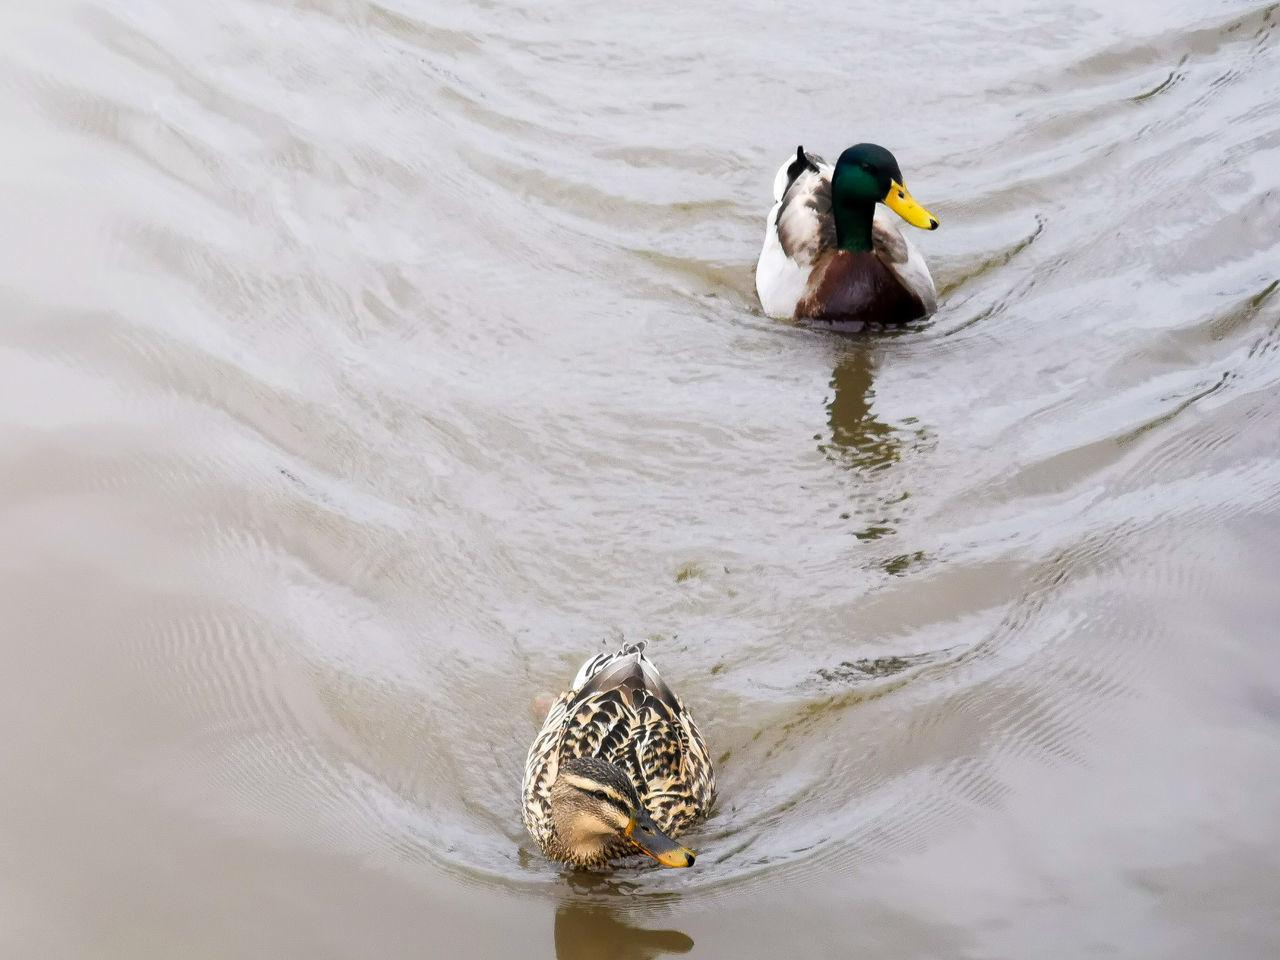 HIGH ANGLE VIEW OF MALLARD DUCK SWIMMING IN LAKE